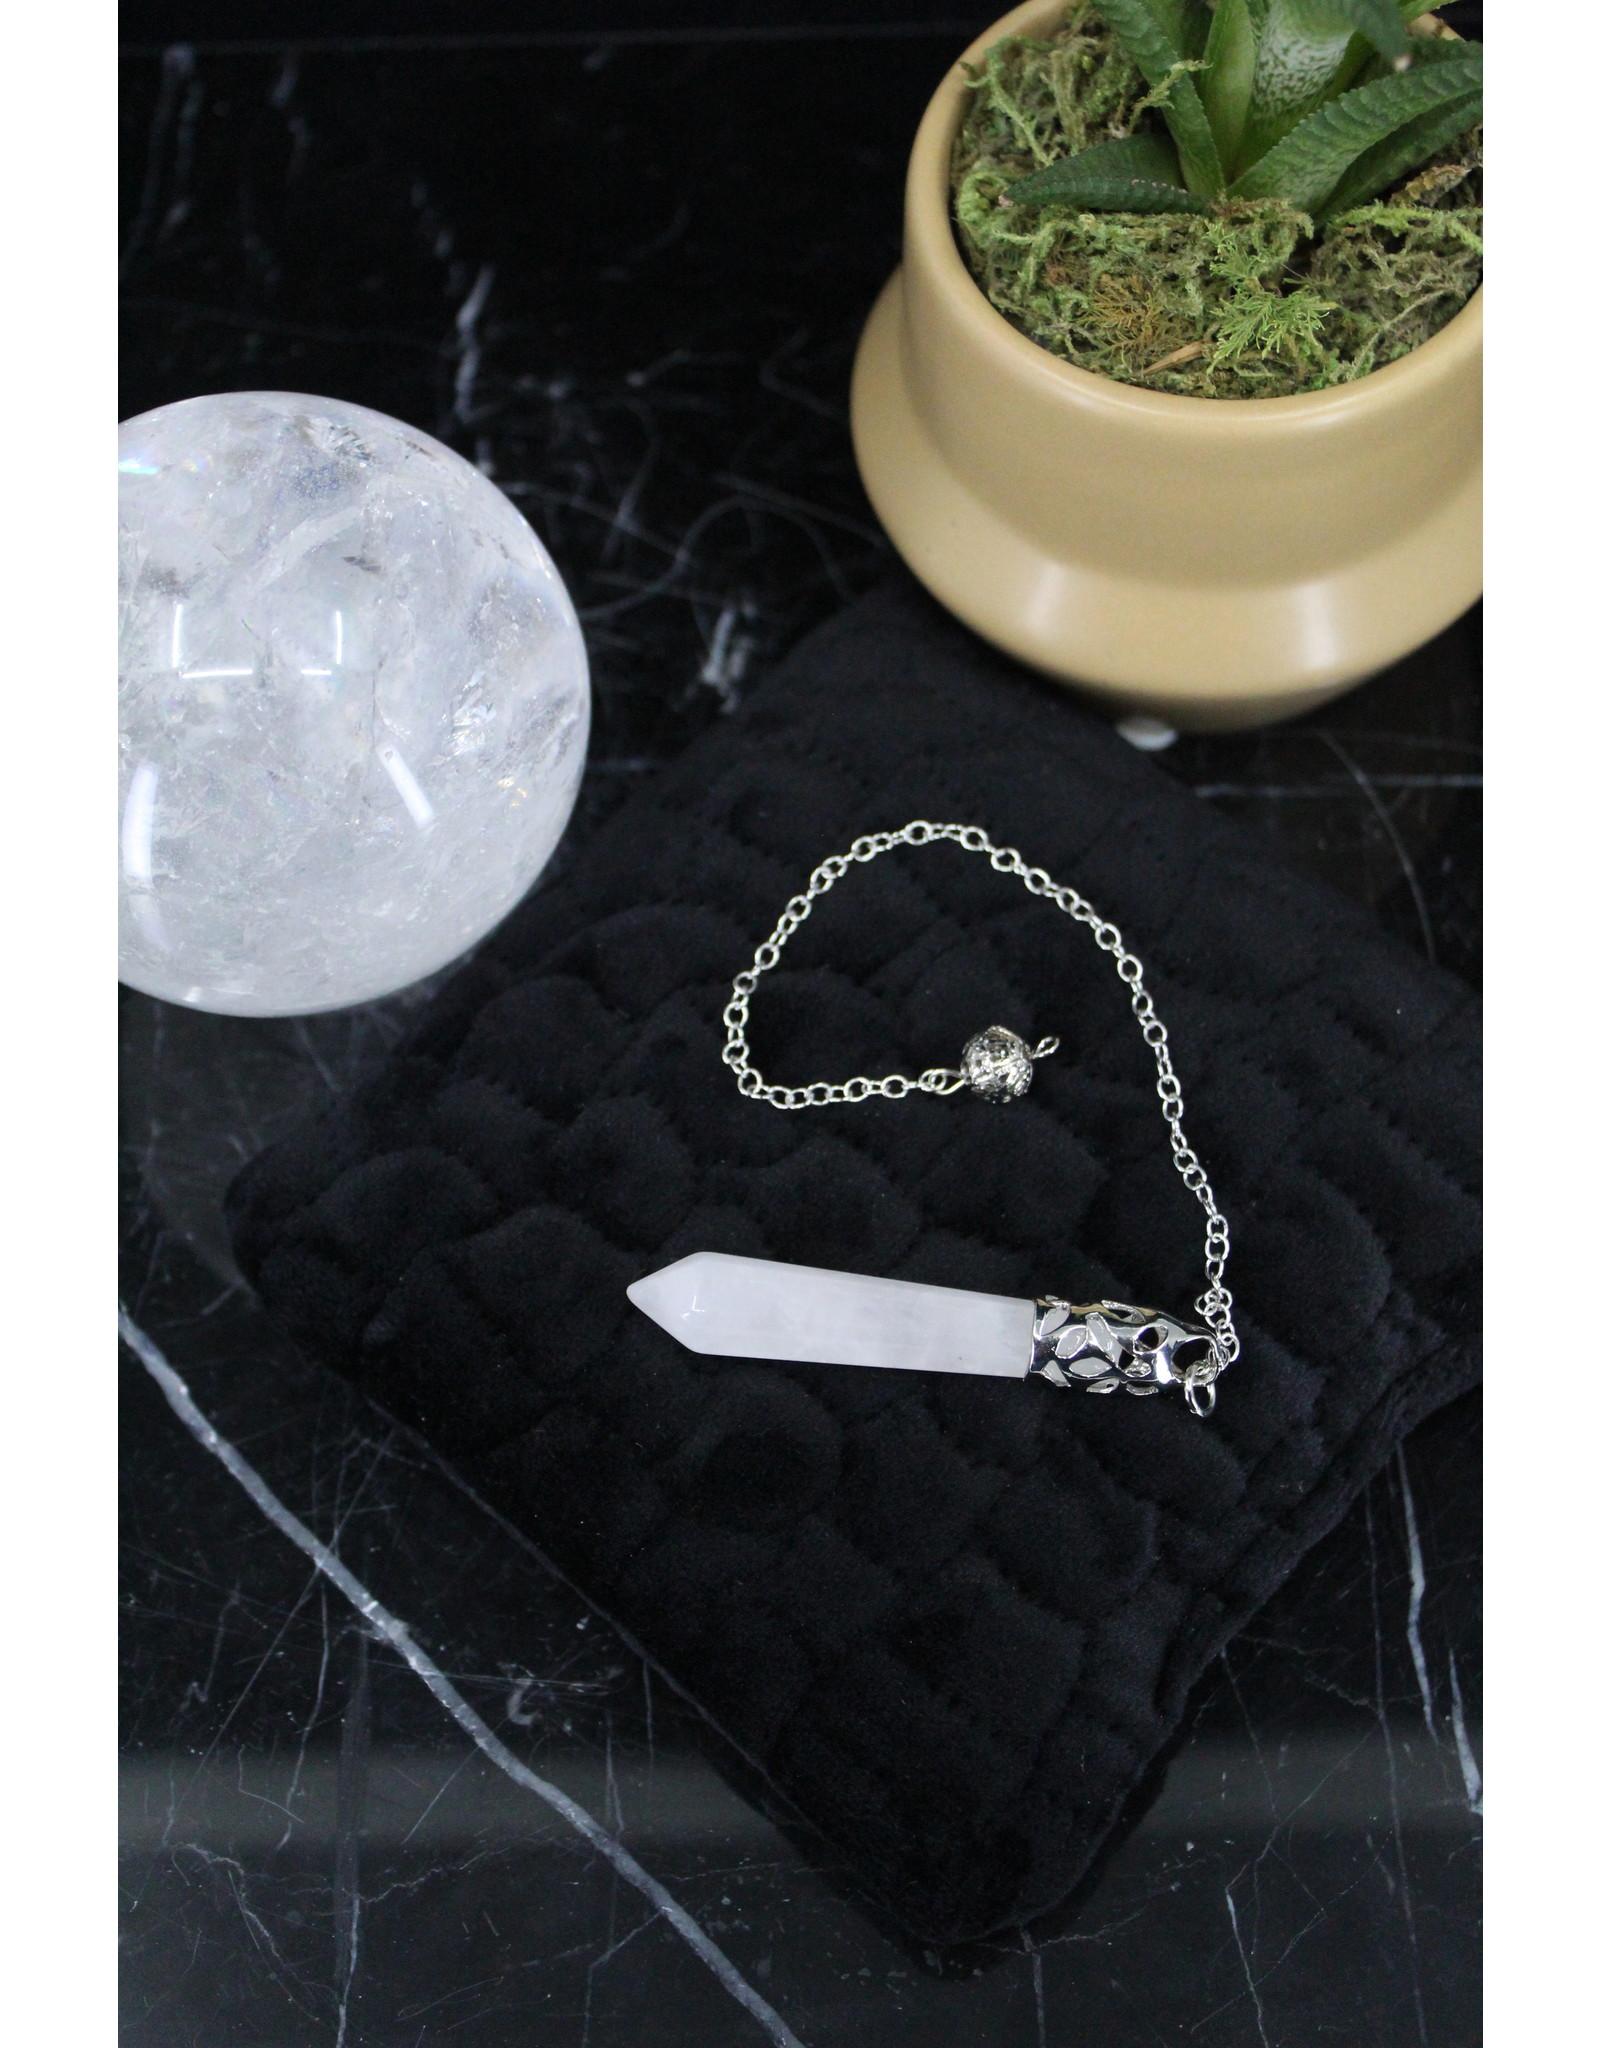 Pendulum -Clear Quartz Silver Capped